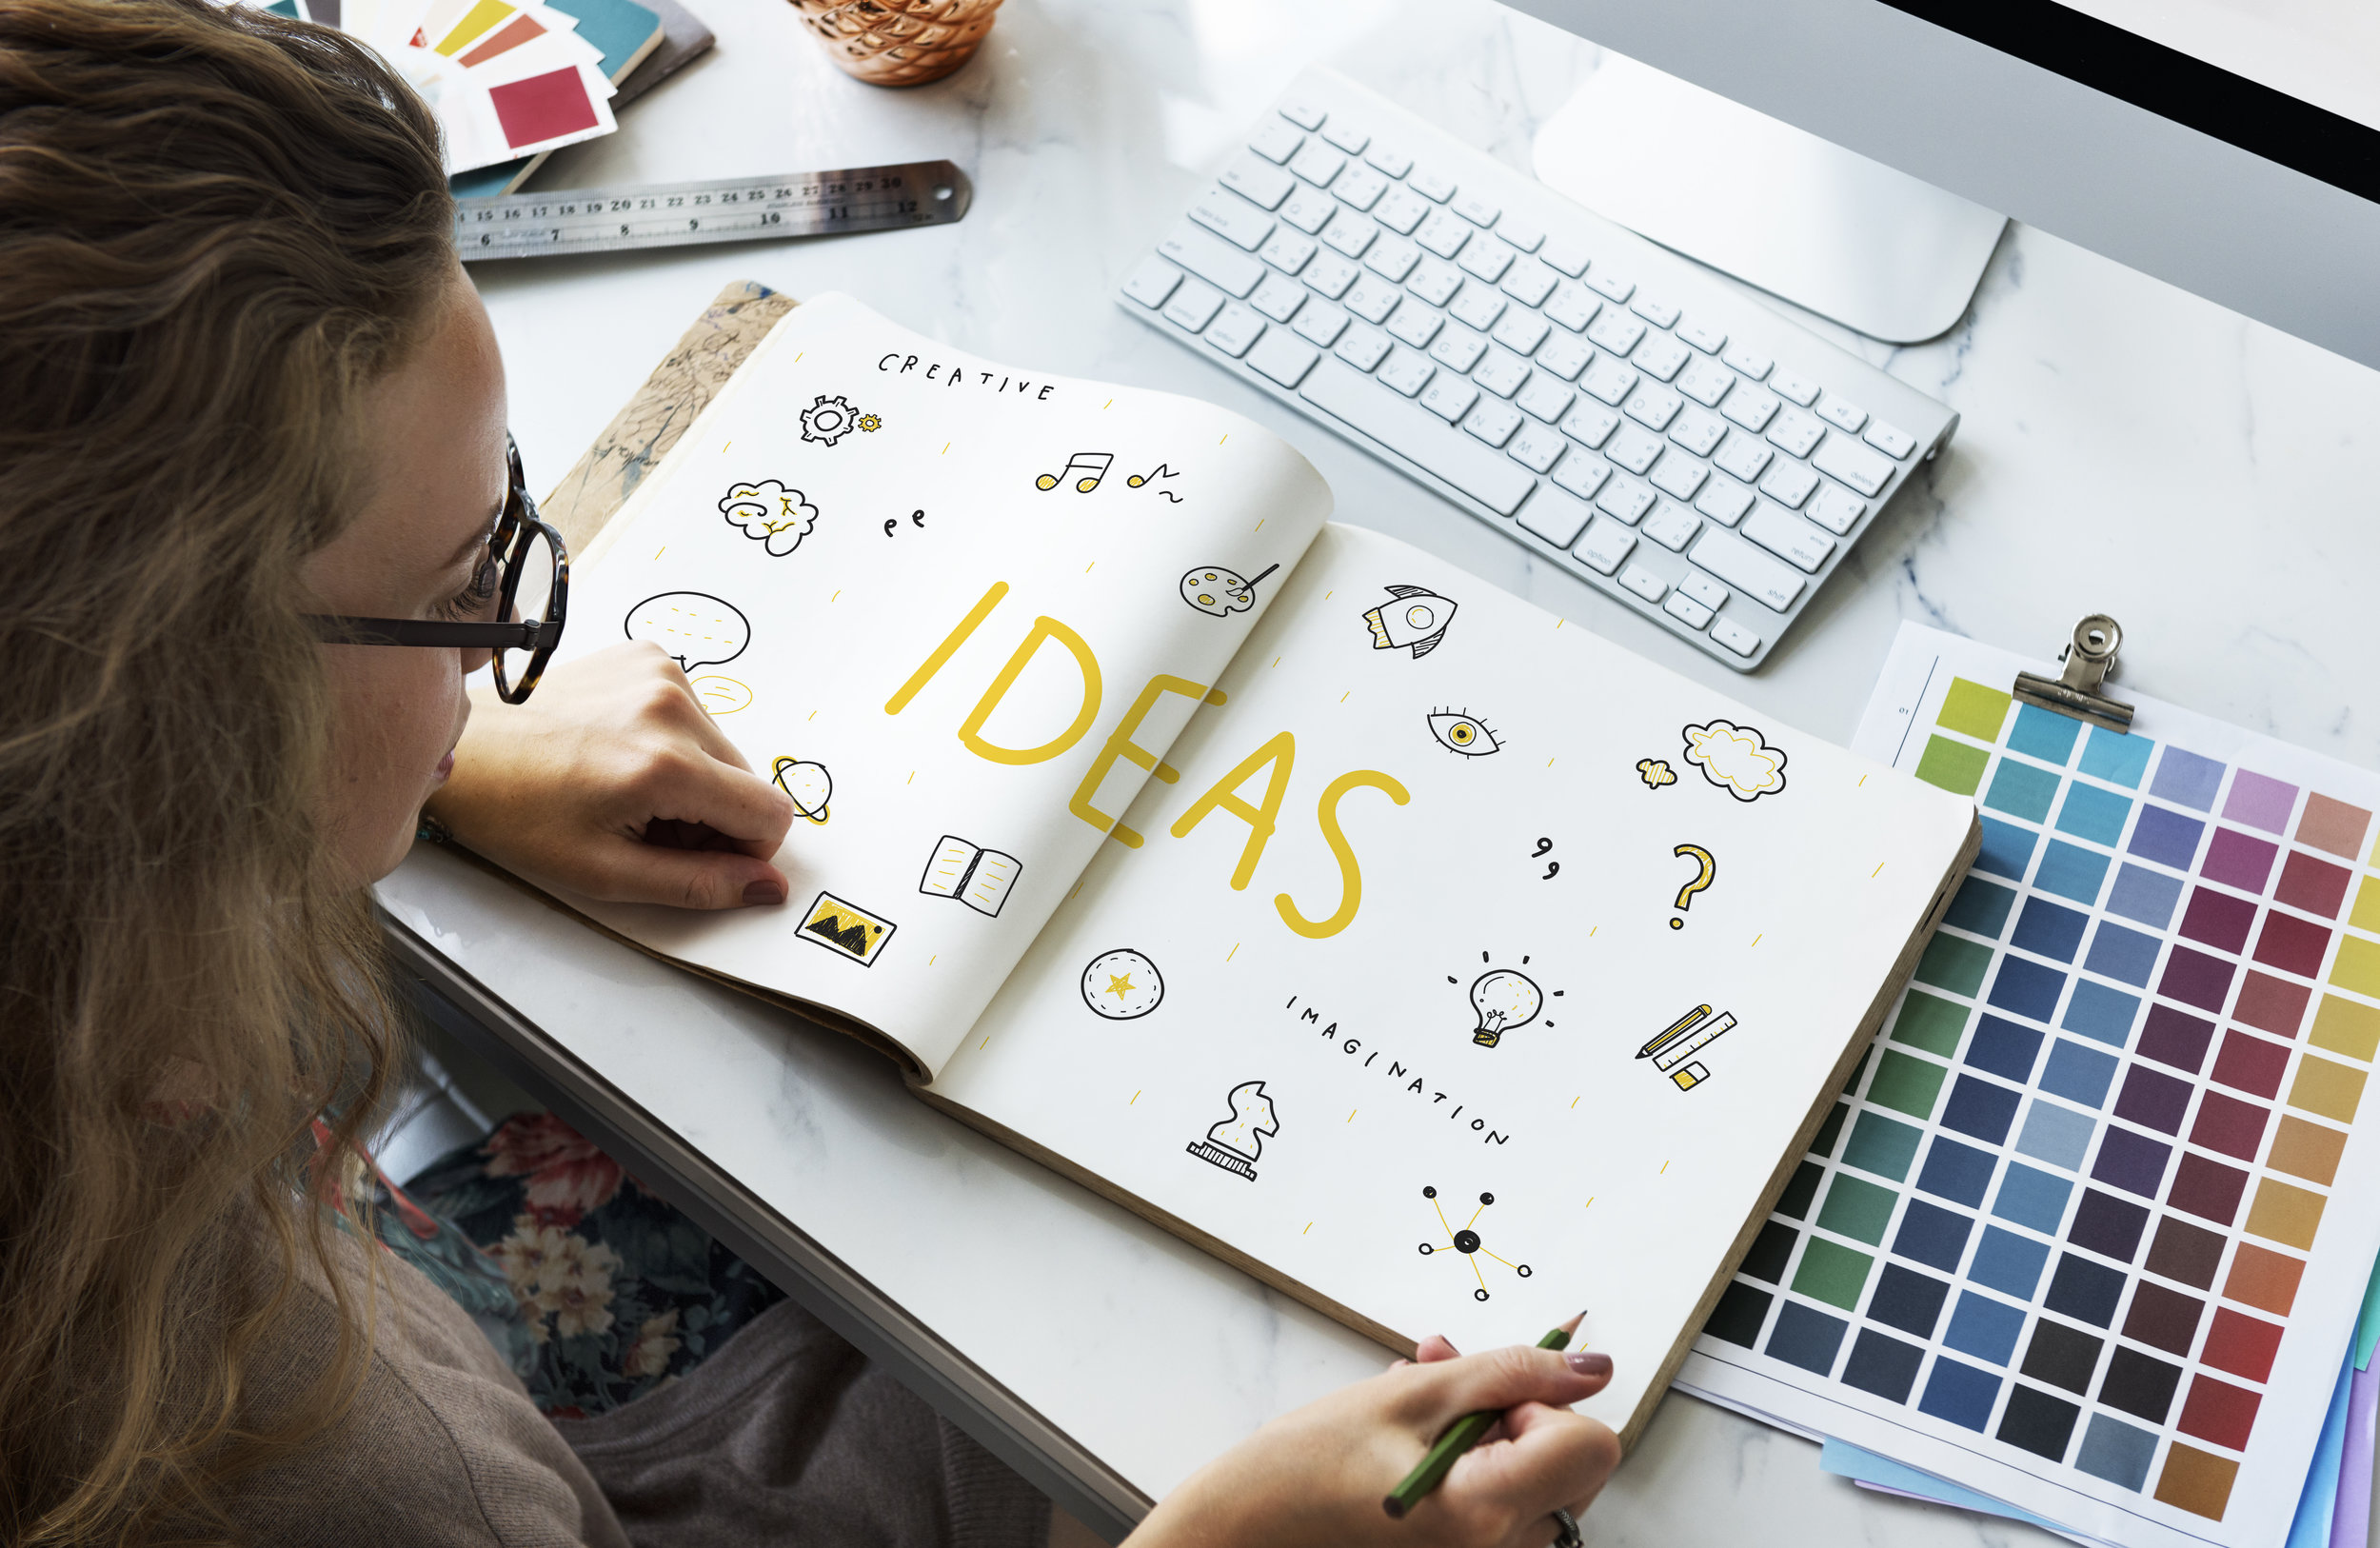 ideas-strategy-action-design-vision-plan-concept-P2TGYBT.jpg